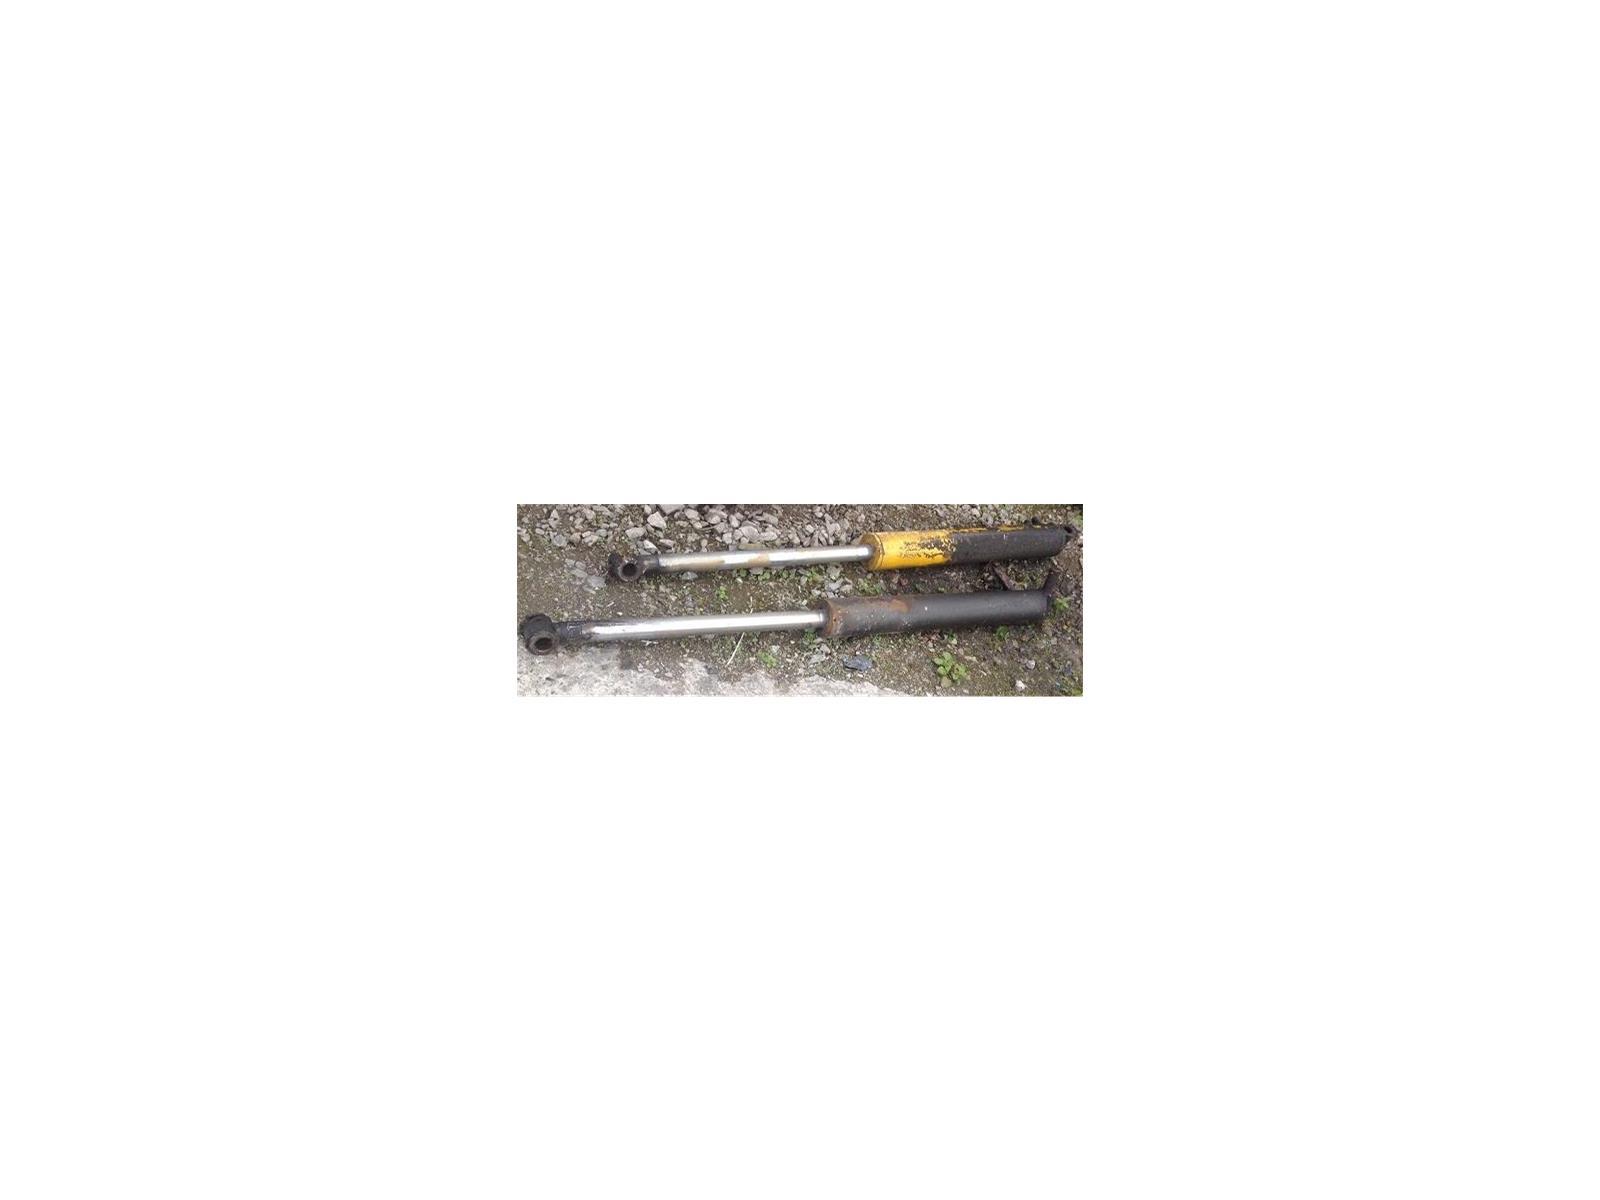 2 X HYDRAULIC RAMS Excavator